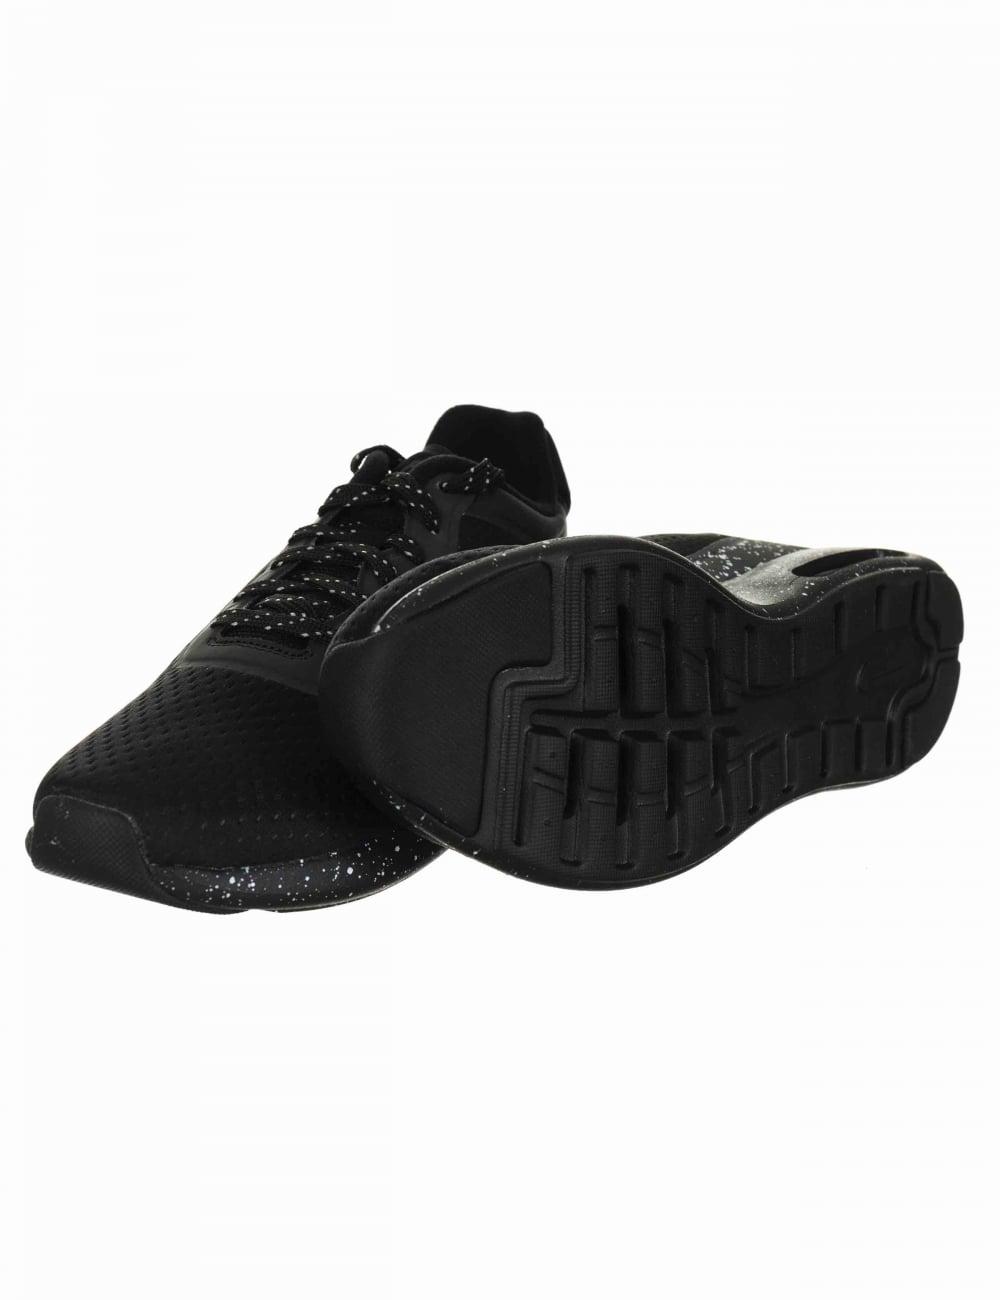 Air Max Modern SE Shoes - Black/Black-Team Orange